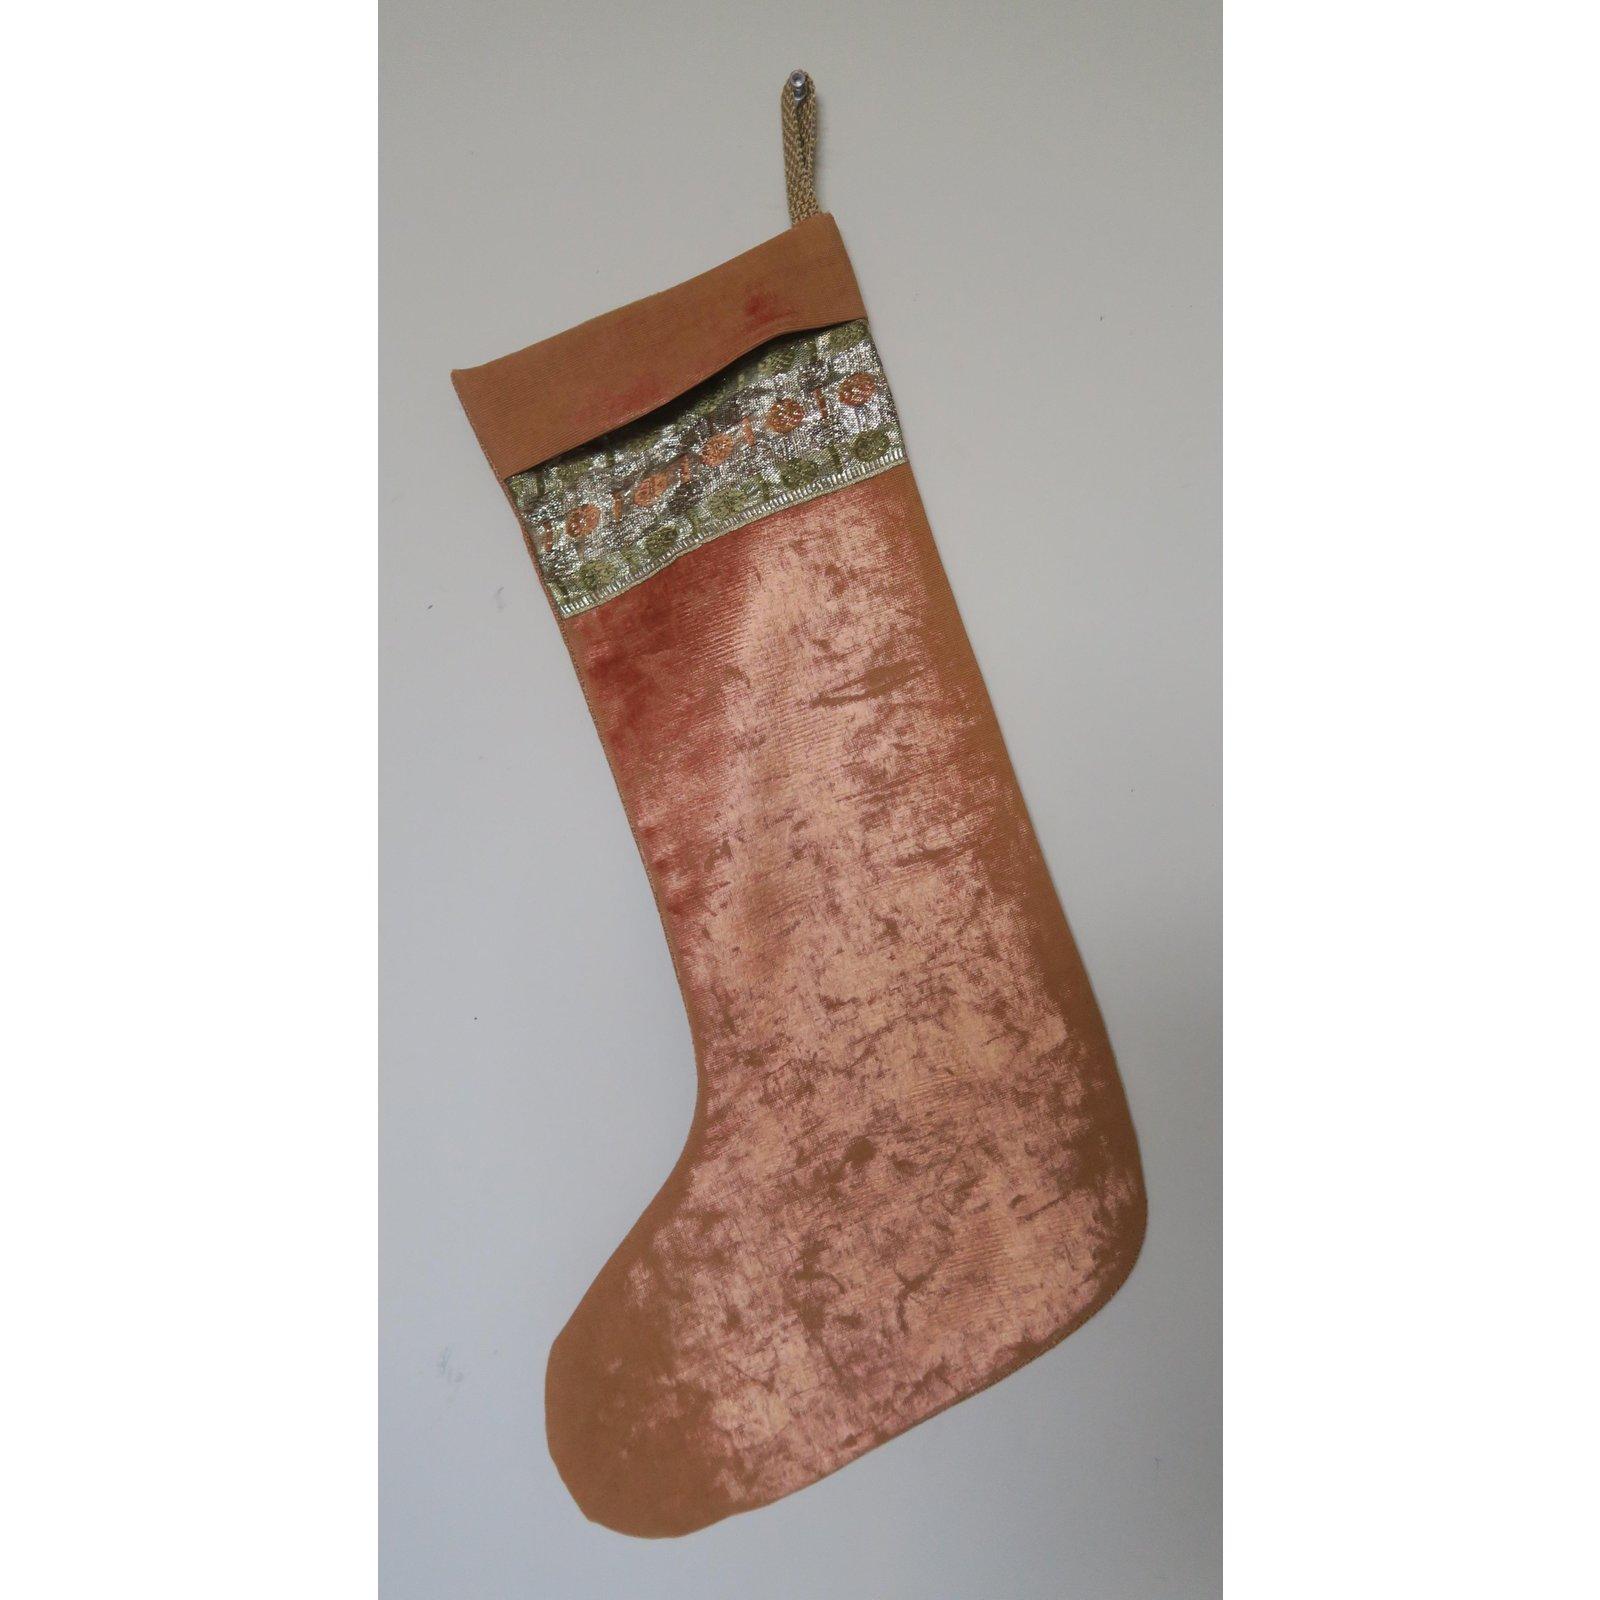 Vintage Christmas Stockings.Vintage Velvet Christmas Stocking